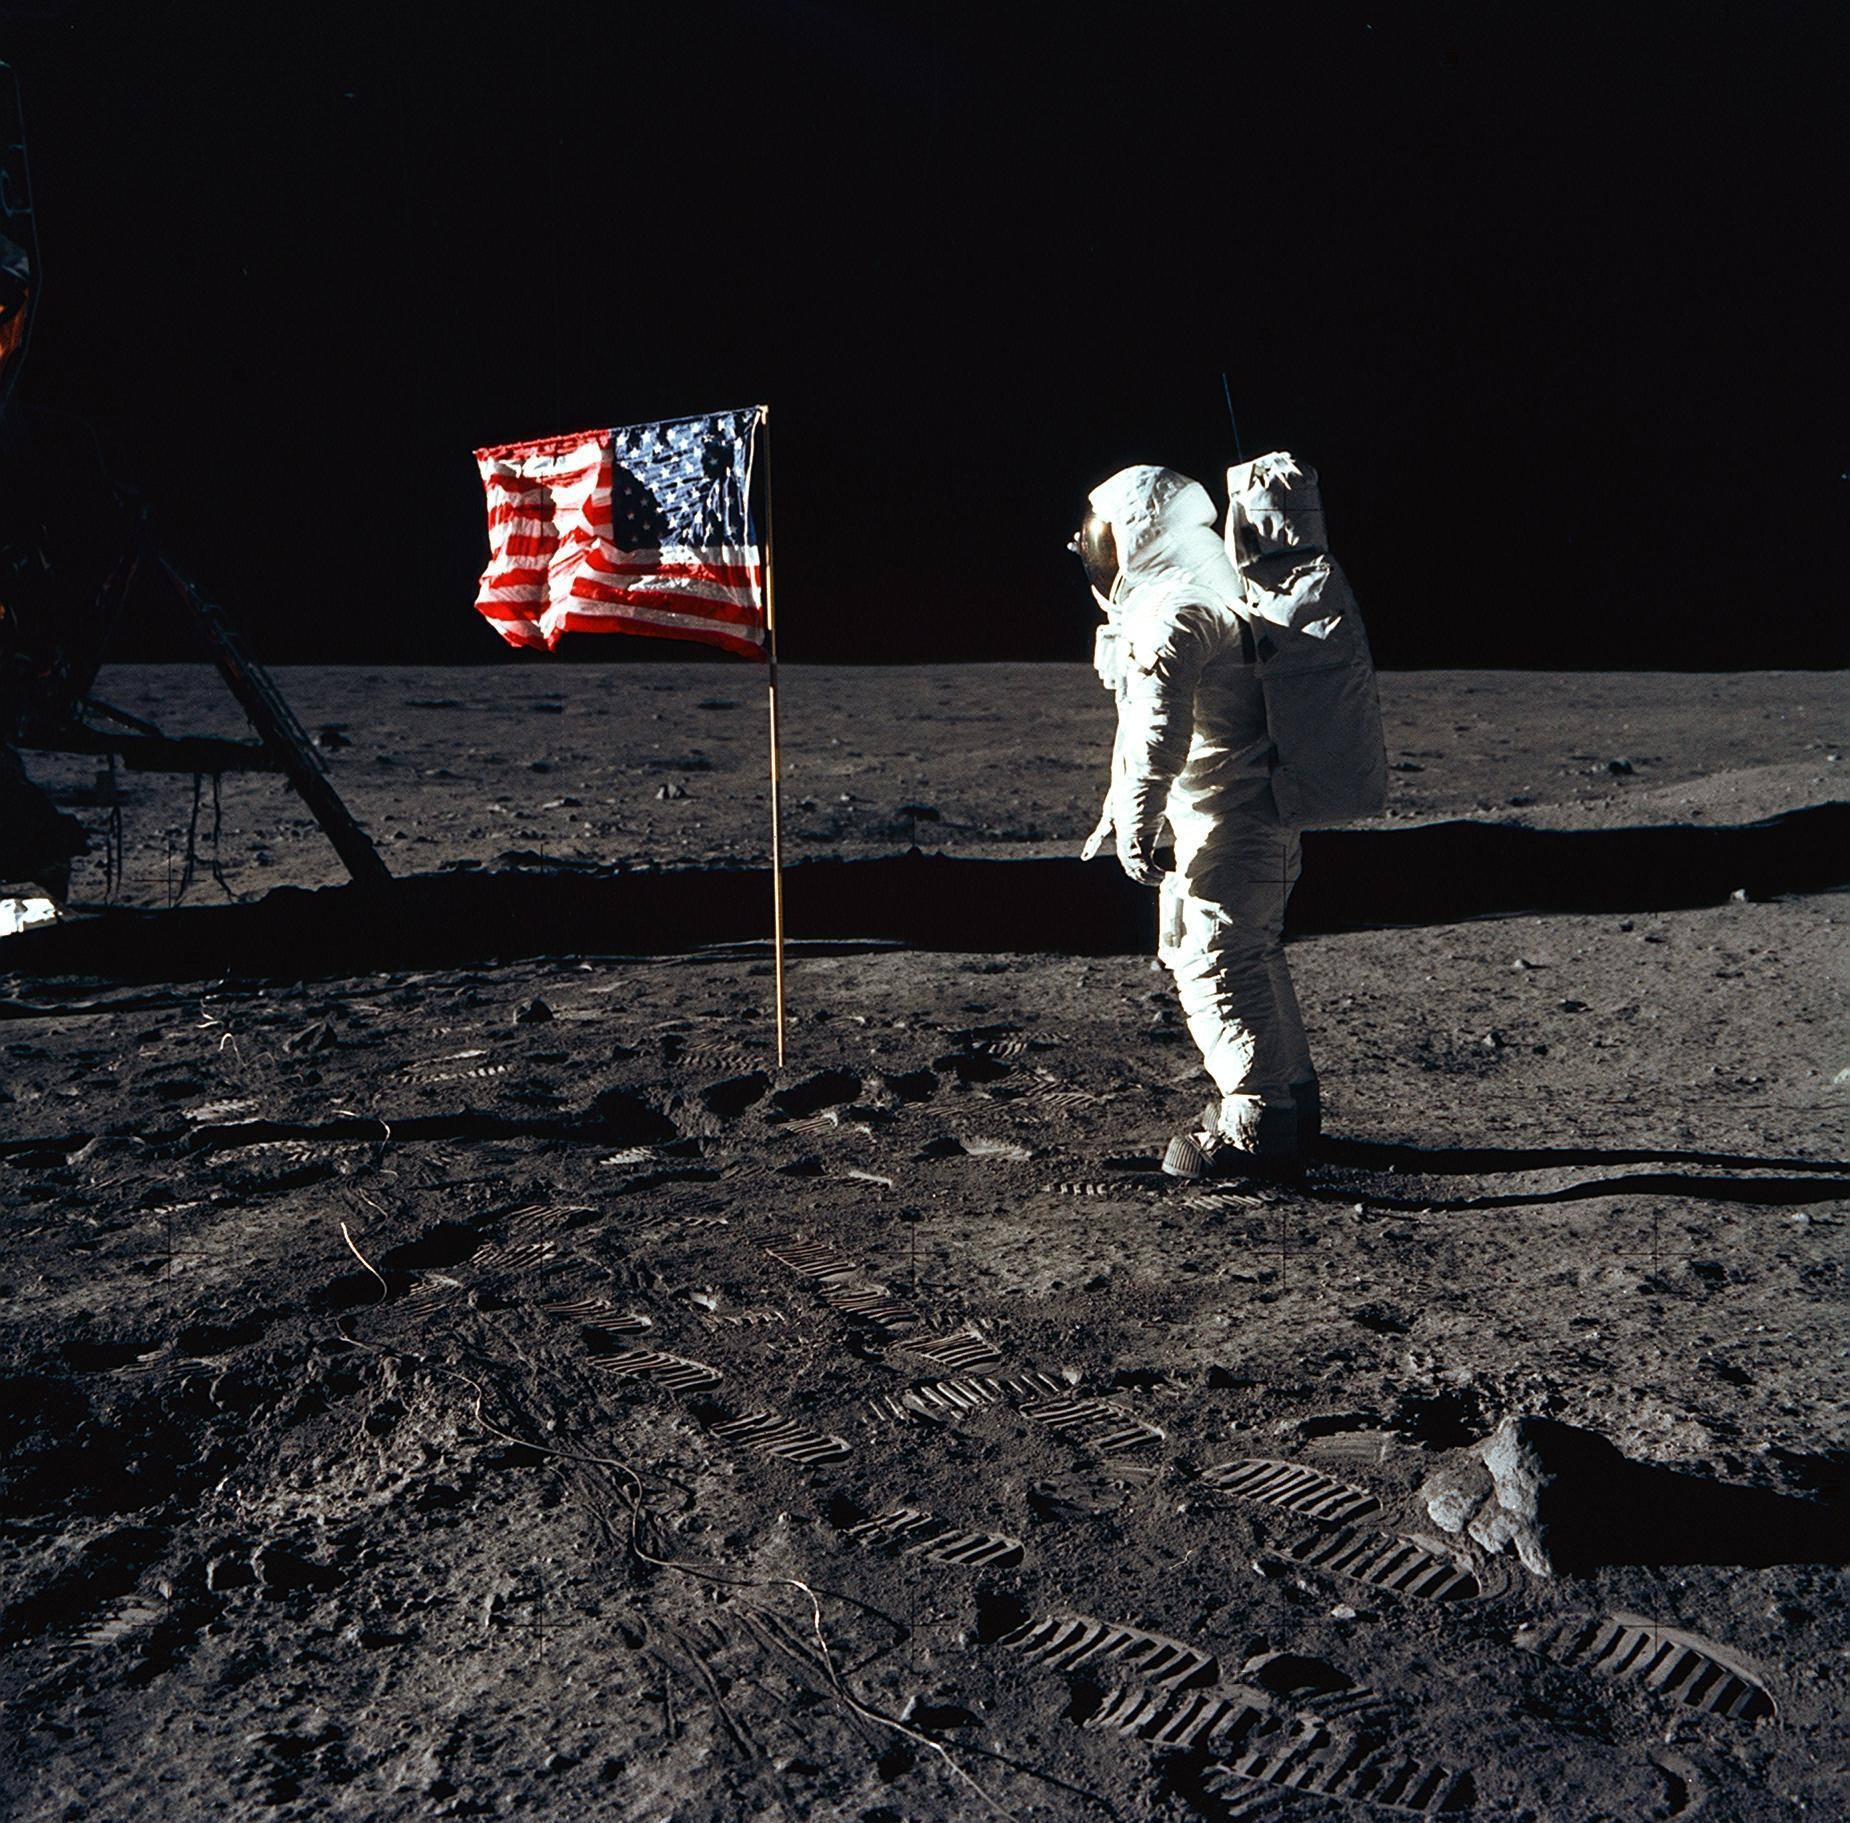 Apollo 11 Buzz Aldrin salutes the US flag on the Moon